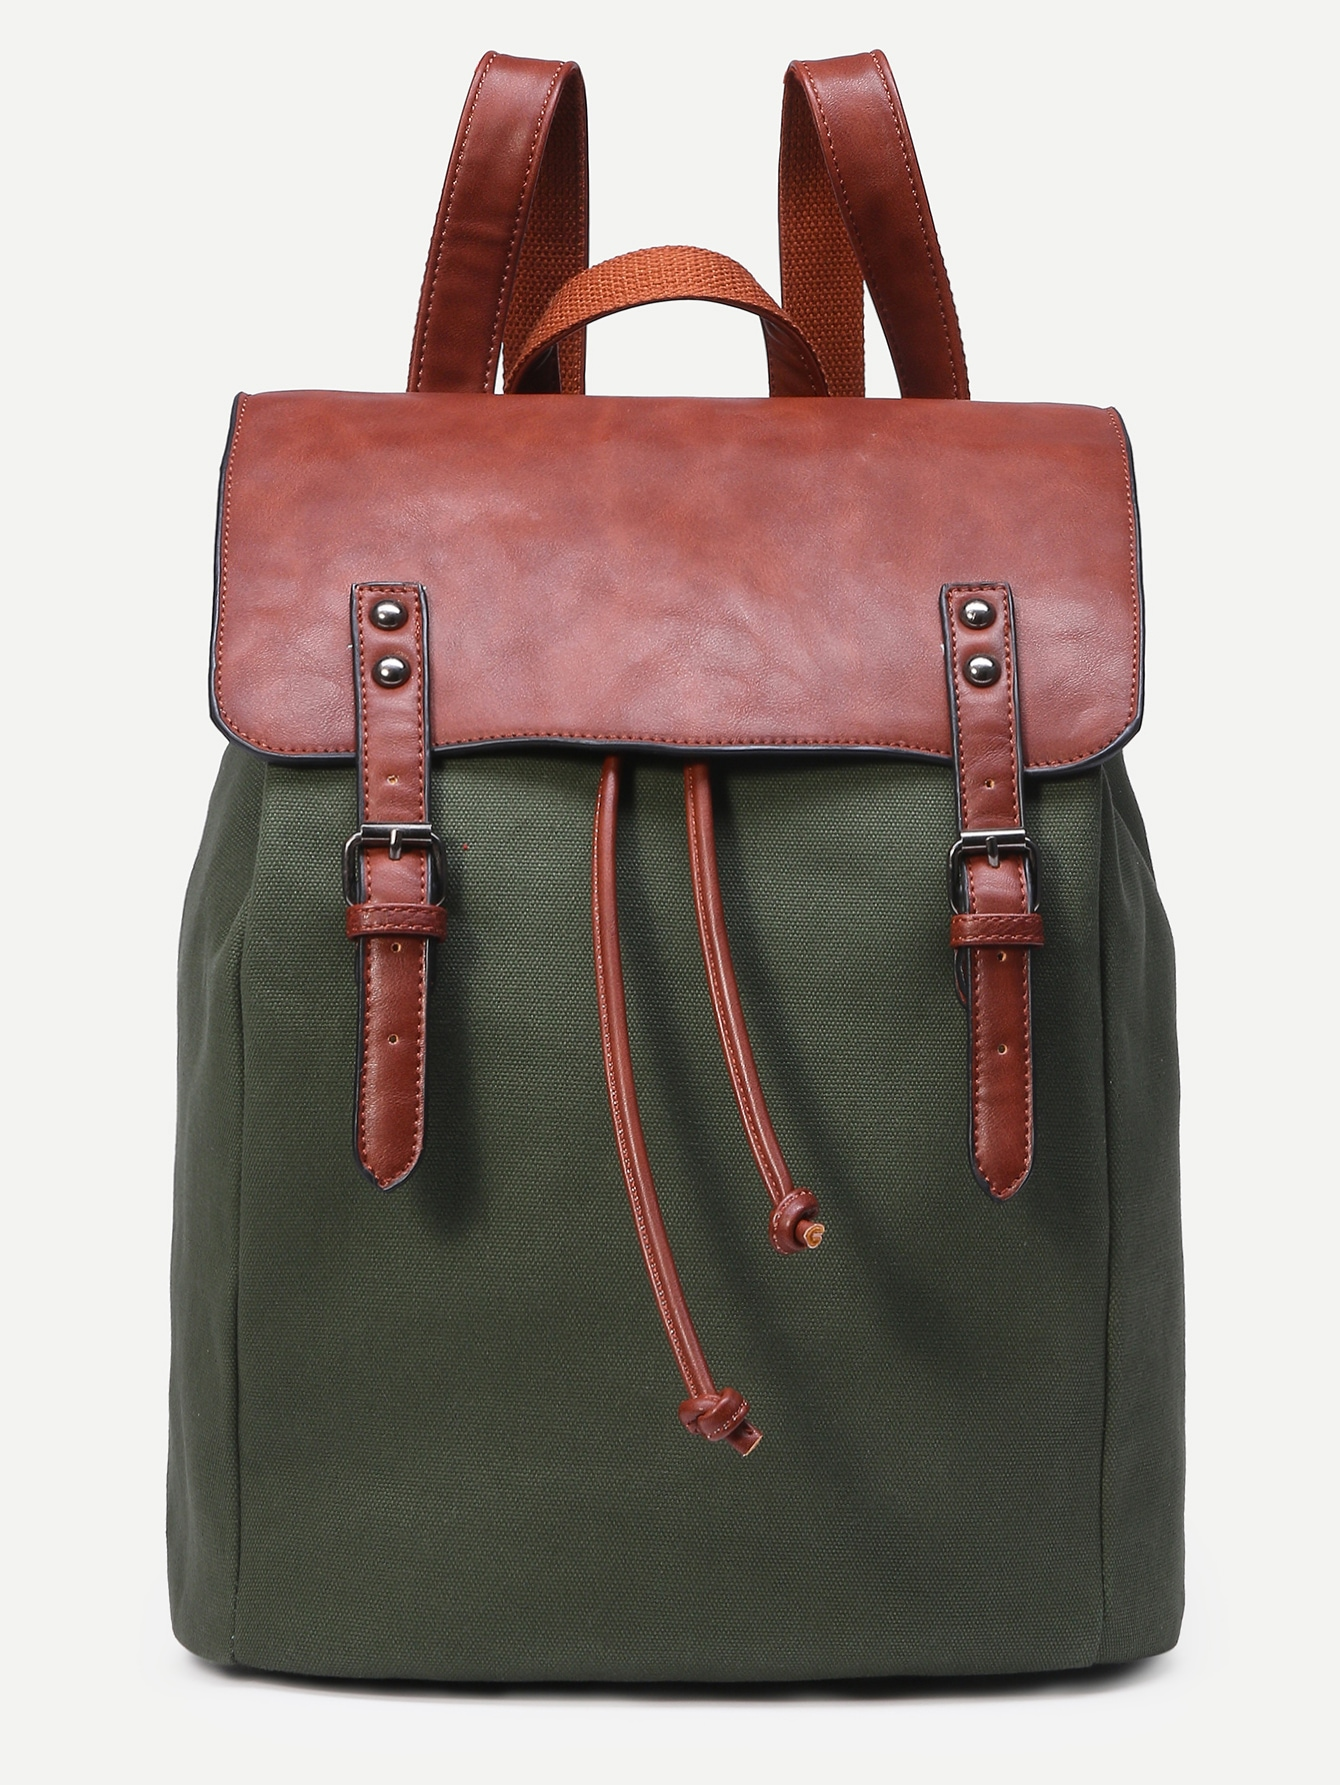 bag160805915_2